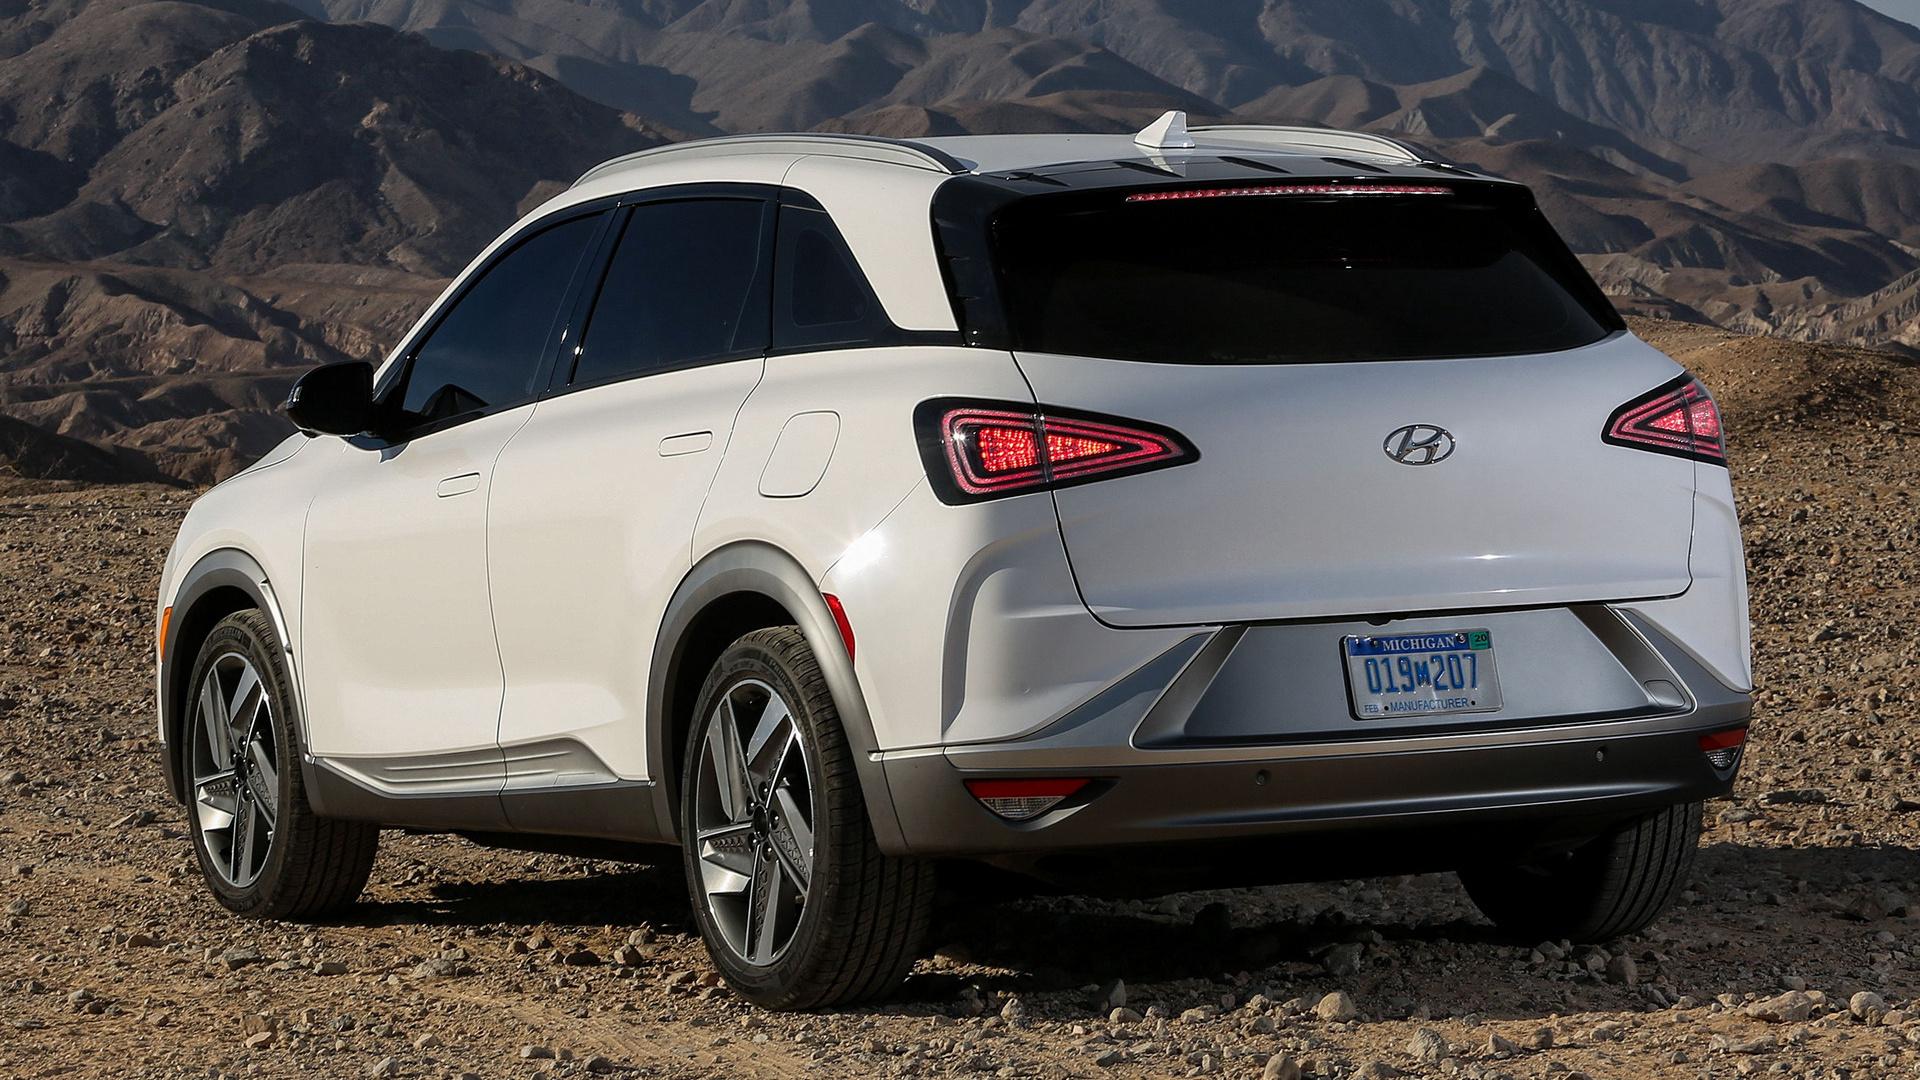 Honda Santa Fe >> 2019 Hyundai Nexo (US) - Wallpapers and HD Images   Car Pixel